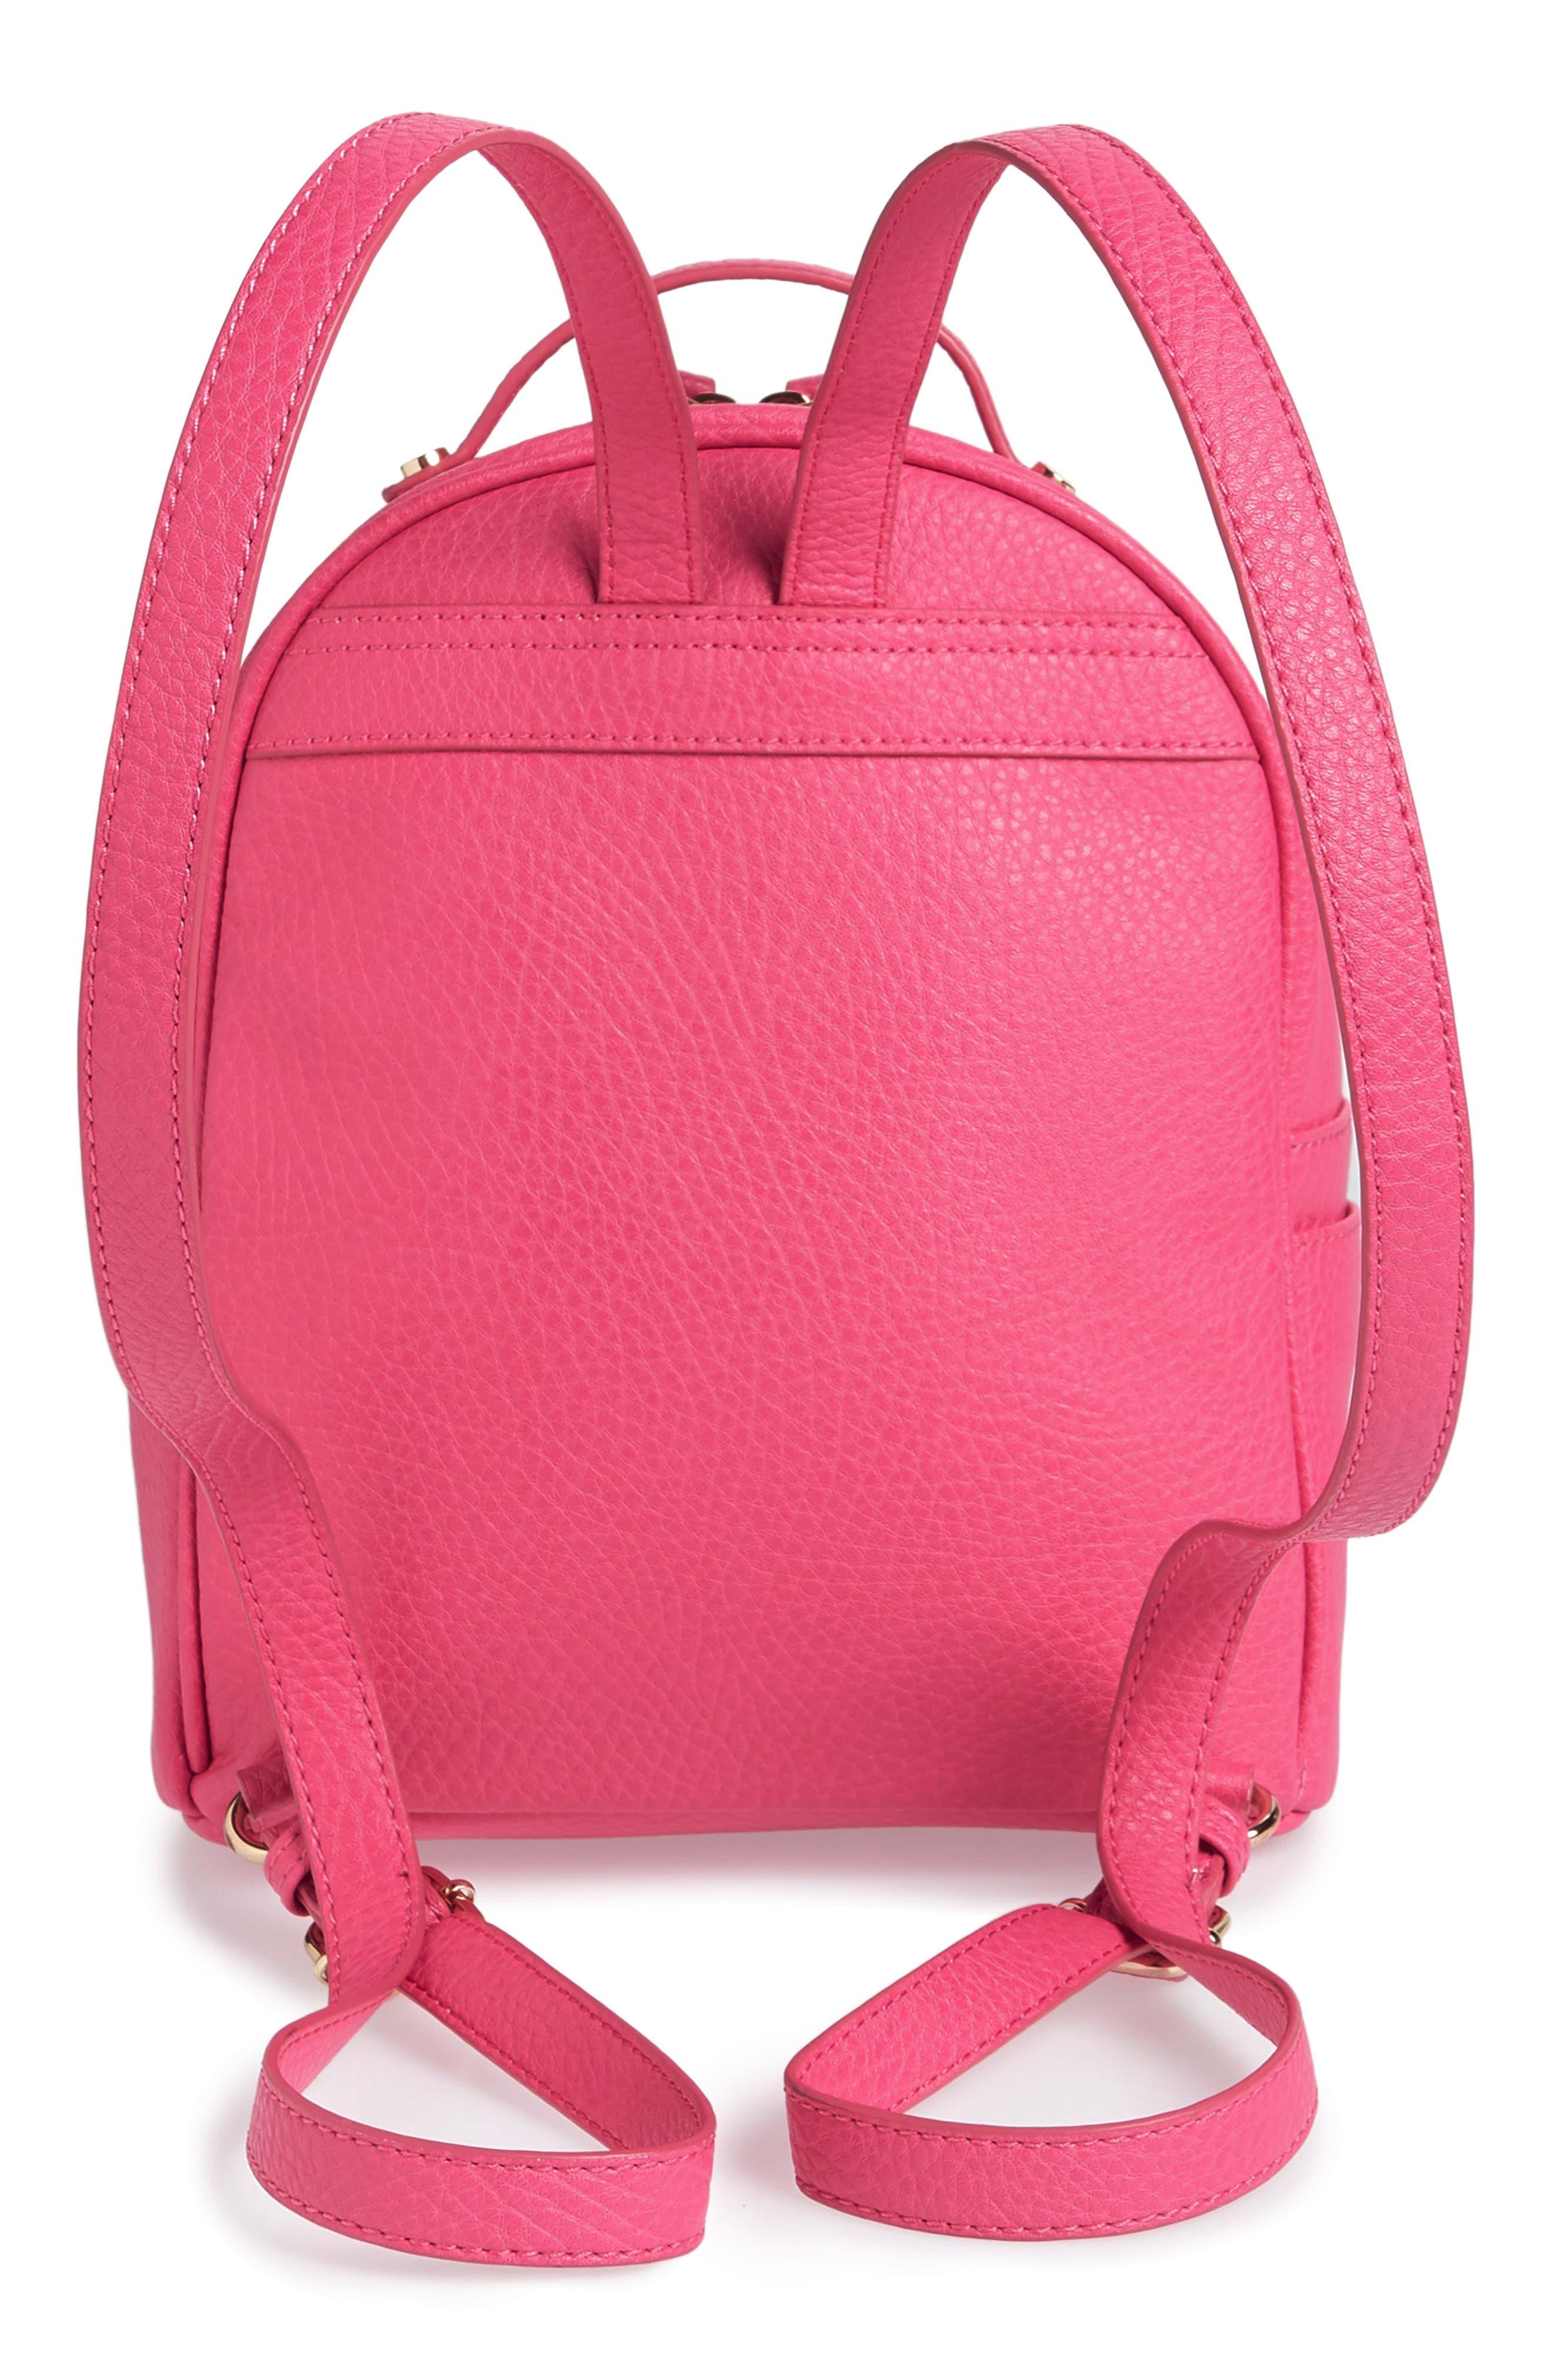 Mali + Lili Hannah Vegan Leather Backpack,                             Alternate thumbnail 3, color,                             Hot Pink